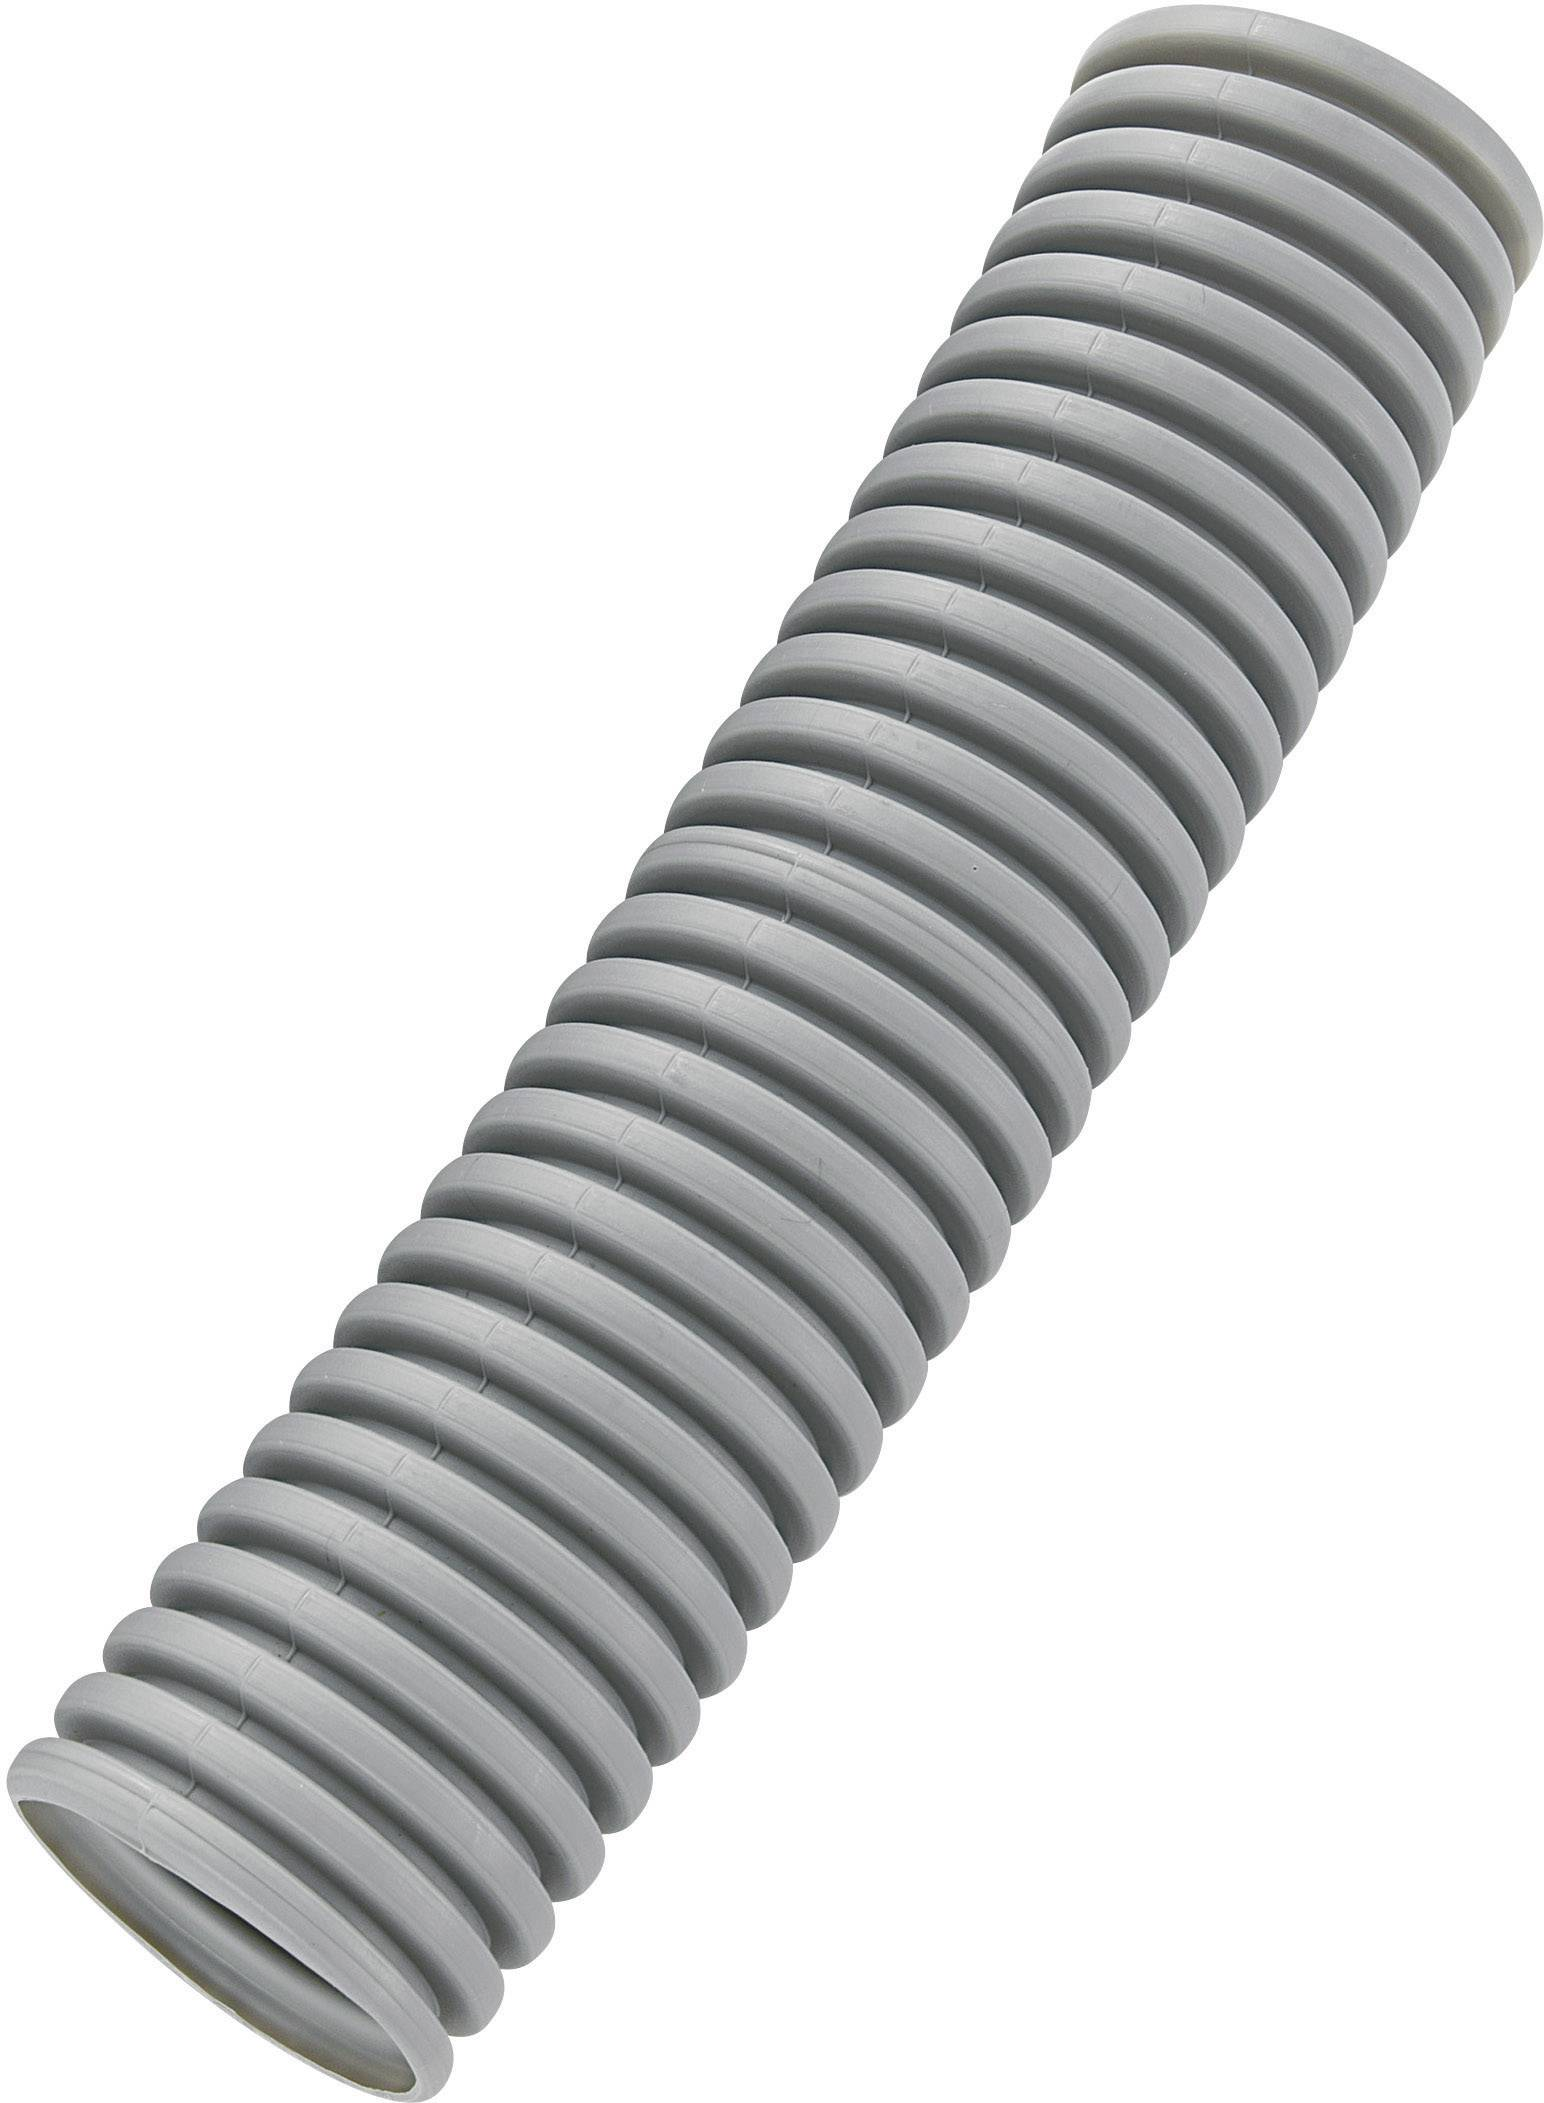 Husí krk KSS BGR16P, 16 mm, šedá